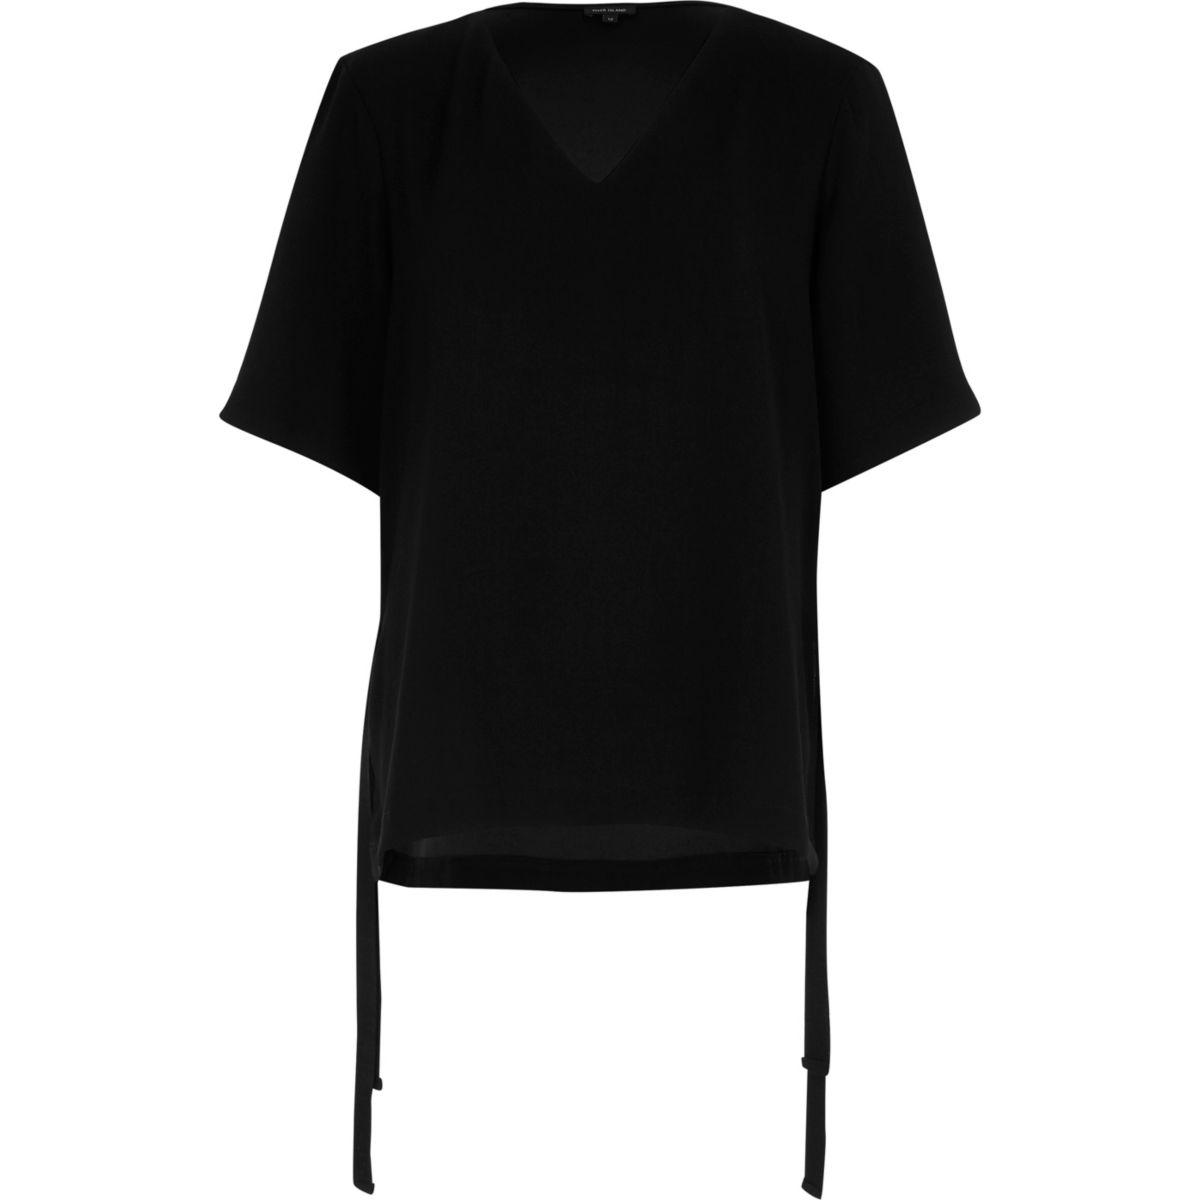 Black short sleeve tie side T-shirt